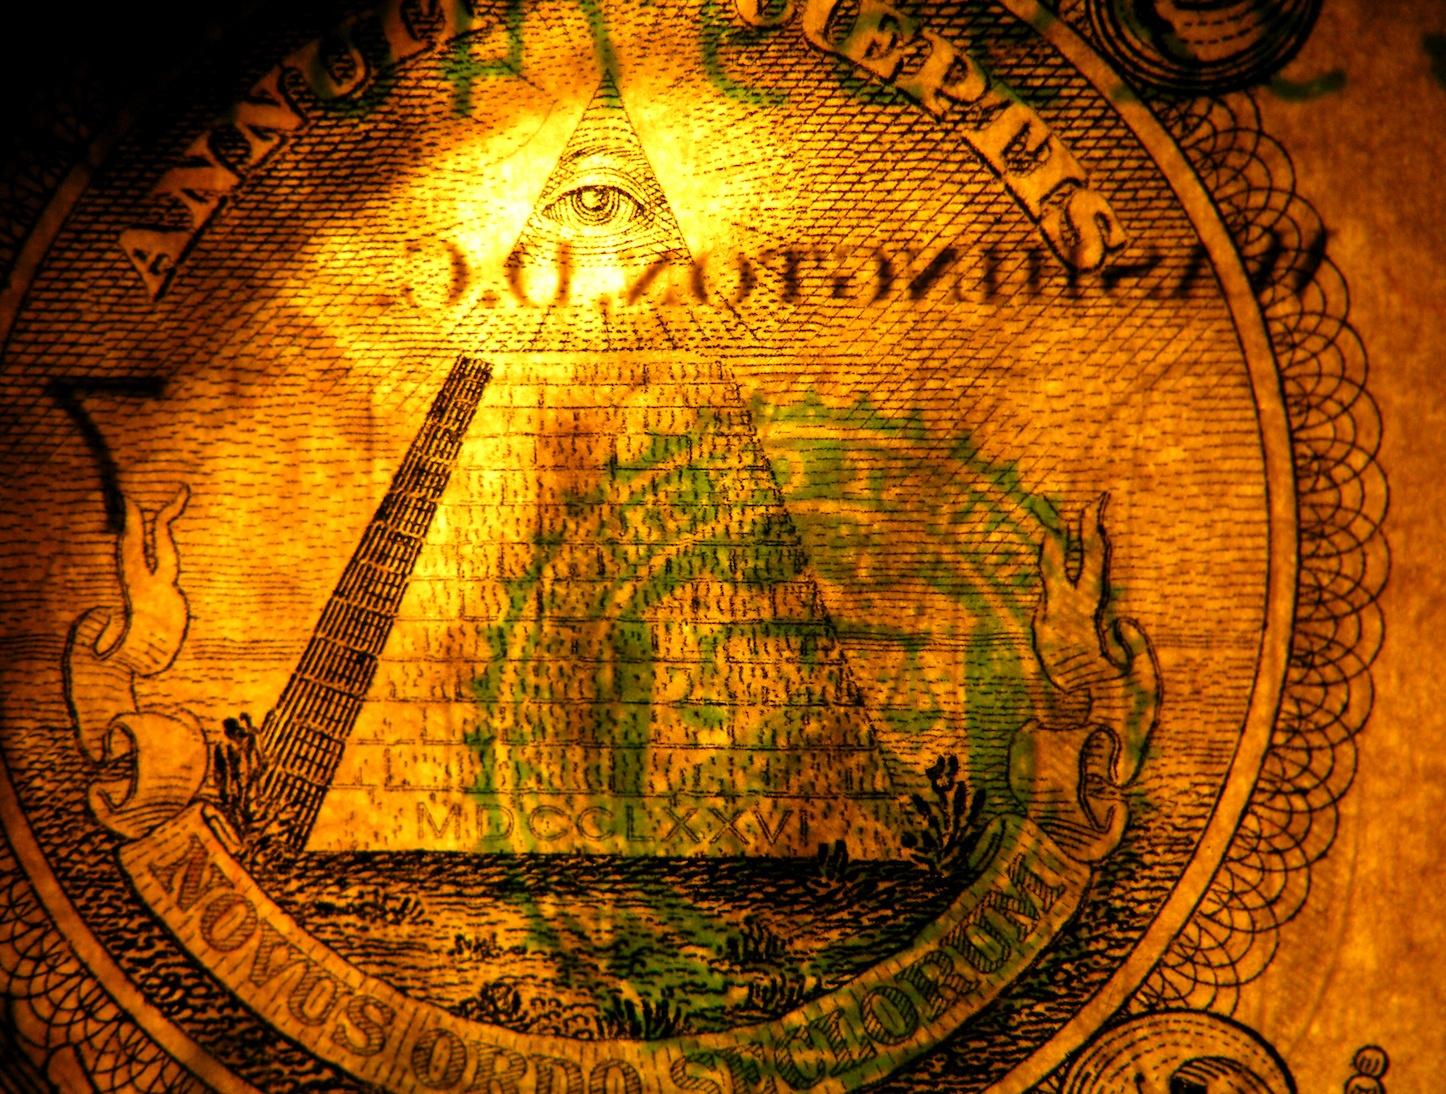 Secret Illuminati Headquarters May Be in These American Cities